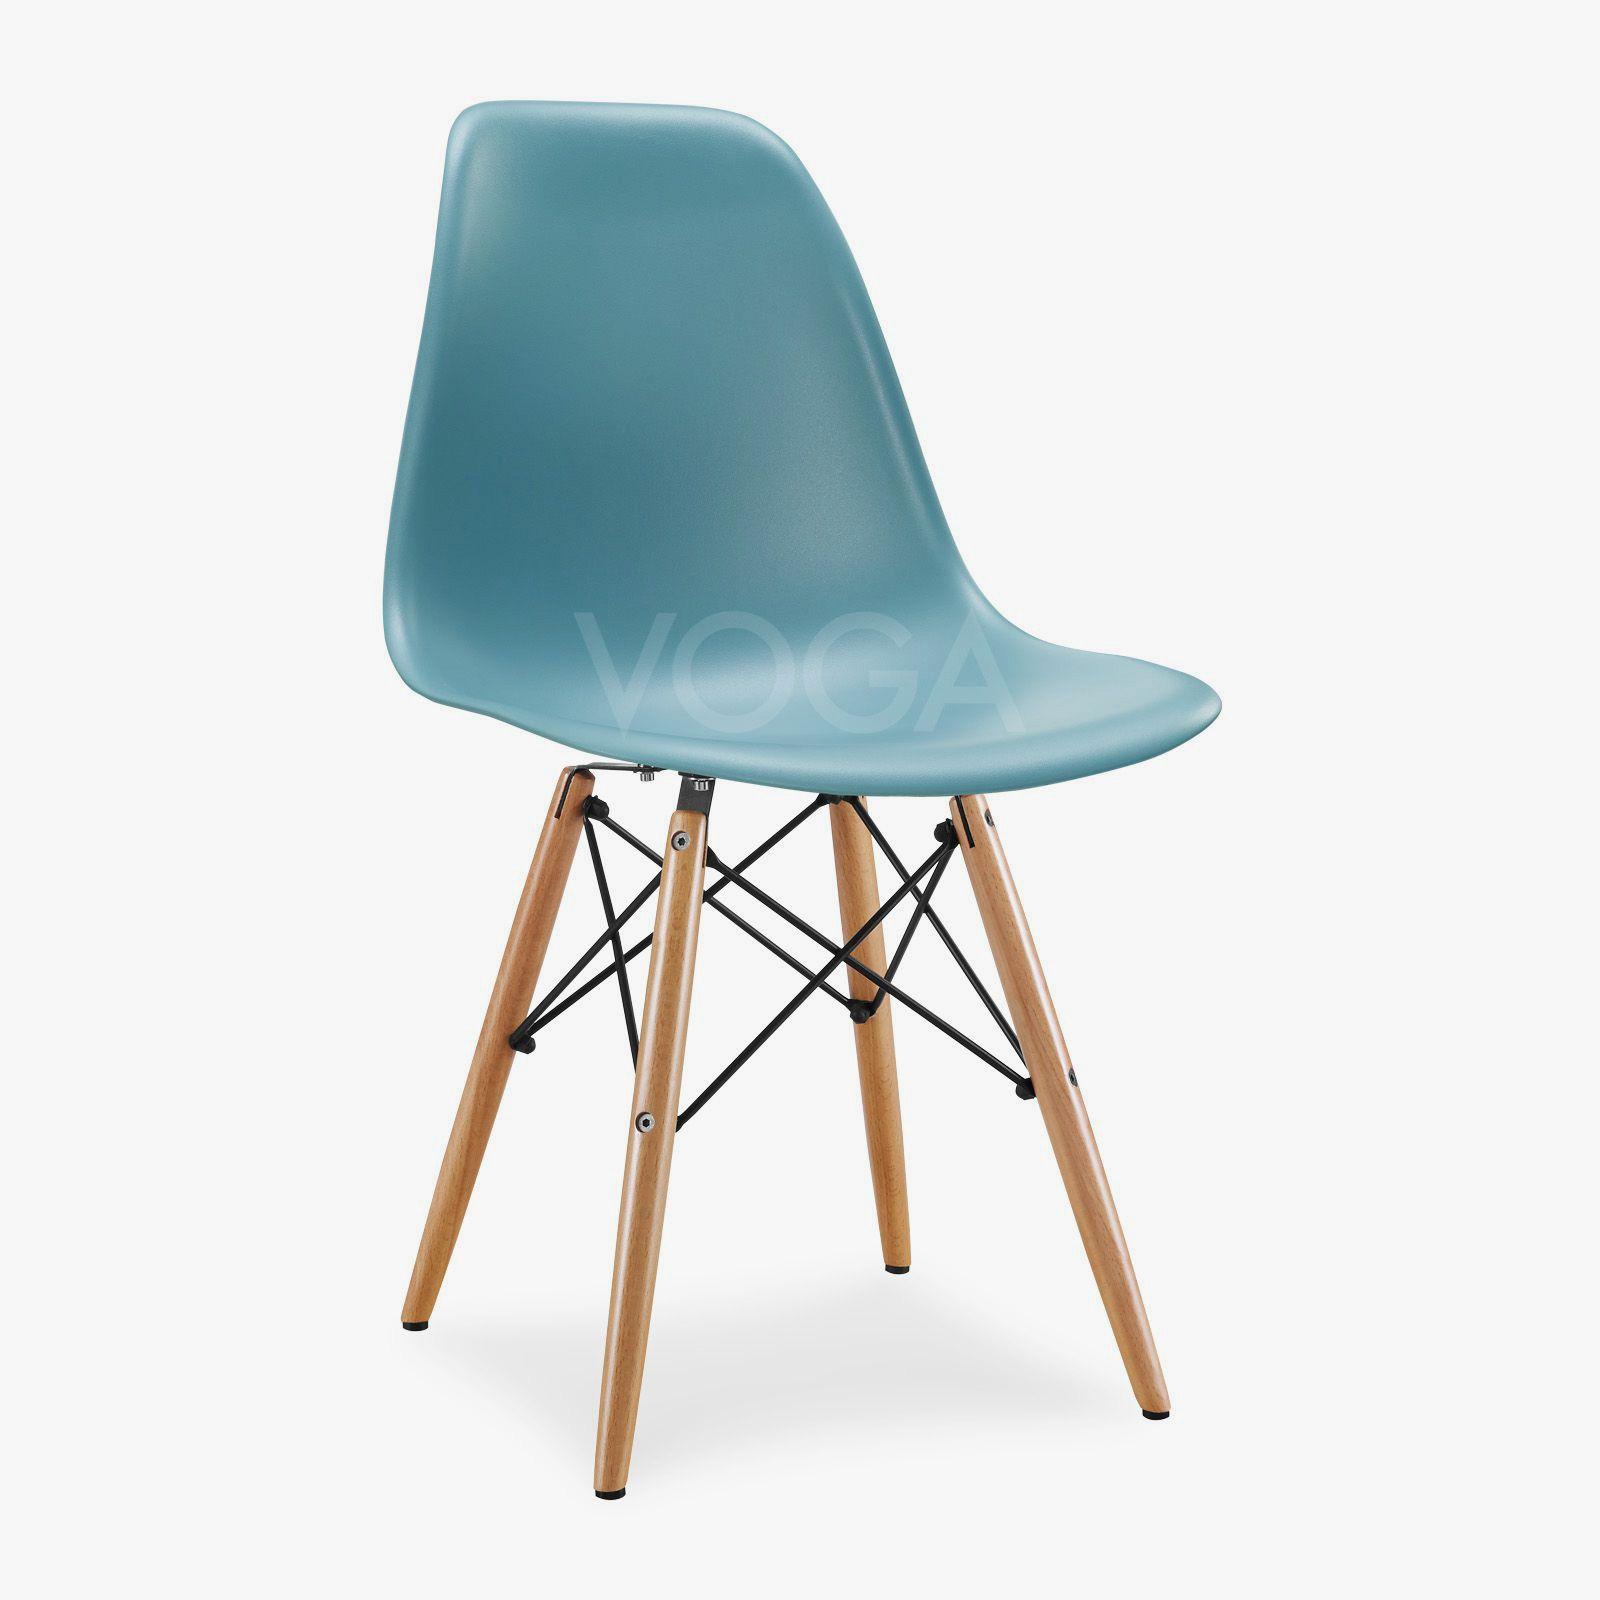 Chaise dsw de charles eames en plastique decor furnishings - Chaise imitation charles eames ...